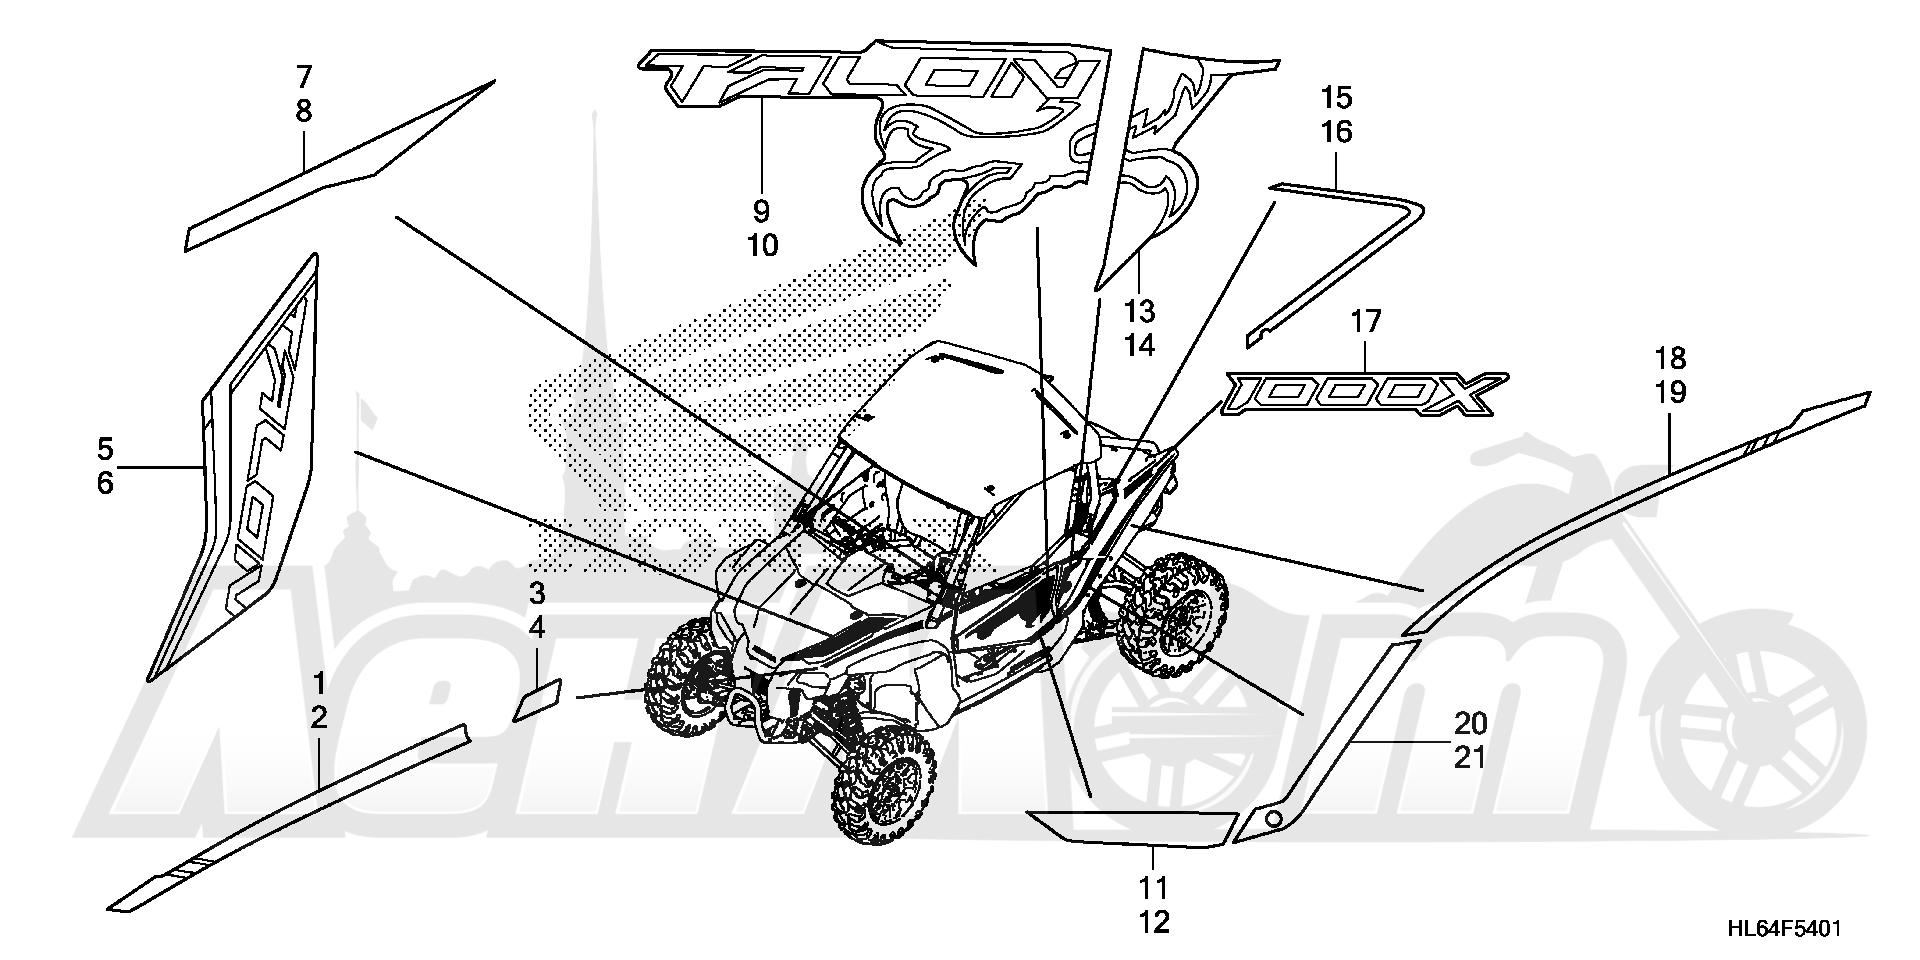 Запчасти для Квадроцикла Honda 2019 SXS1000S2X Раздел: MARK (2)   знак (2)